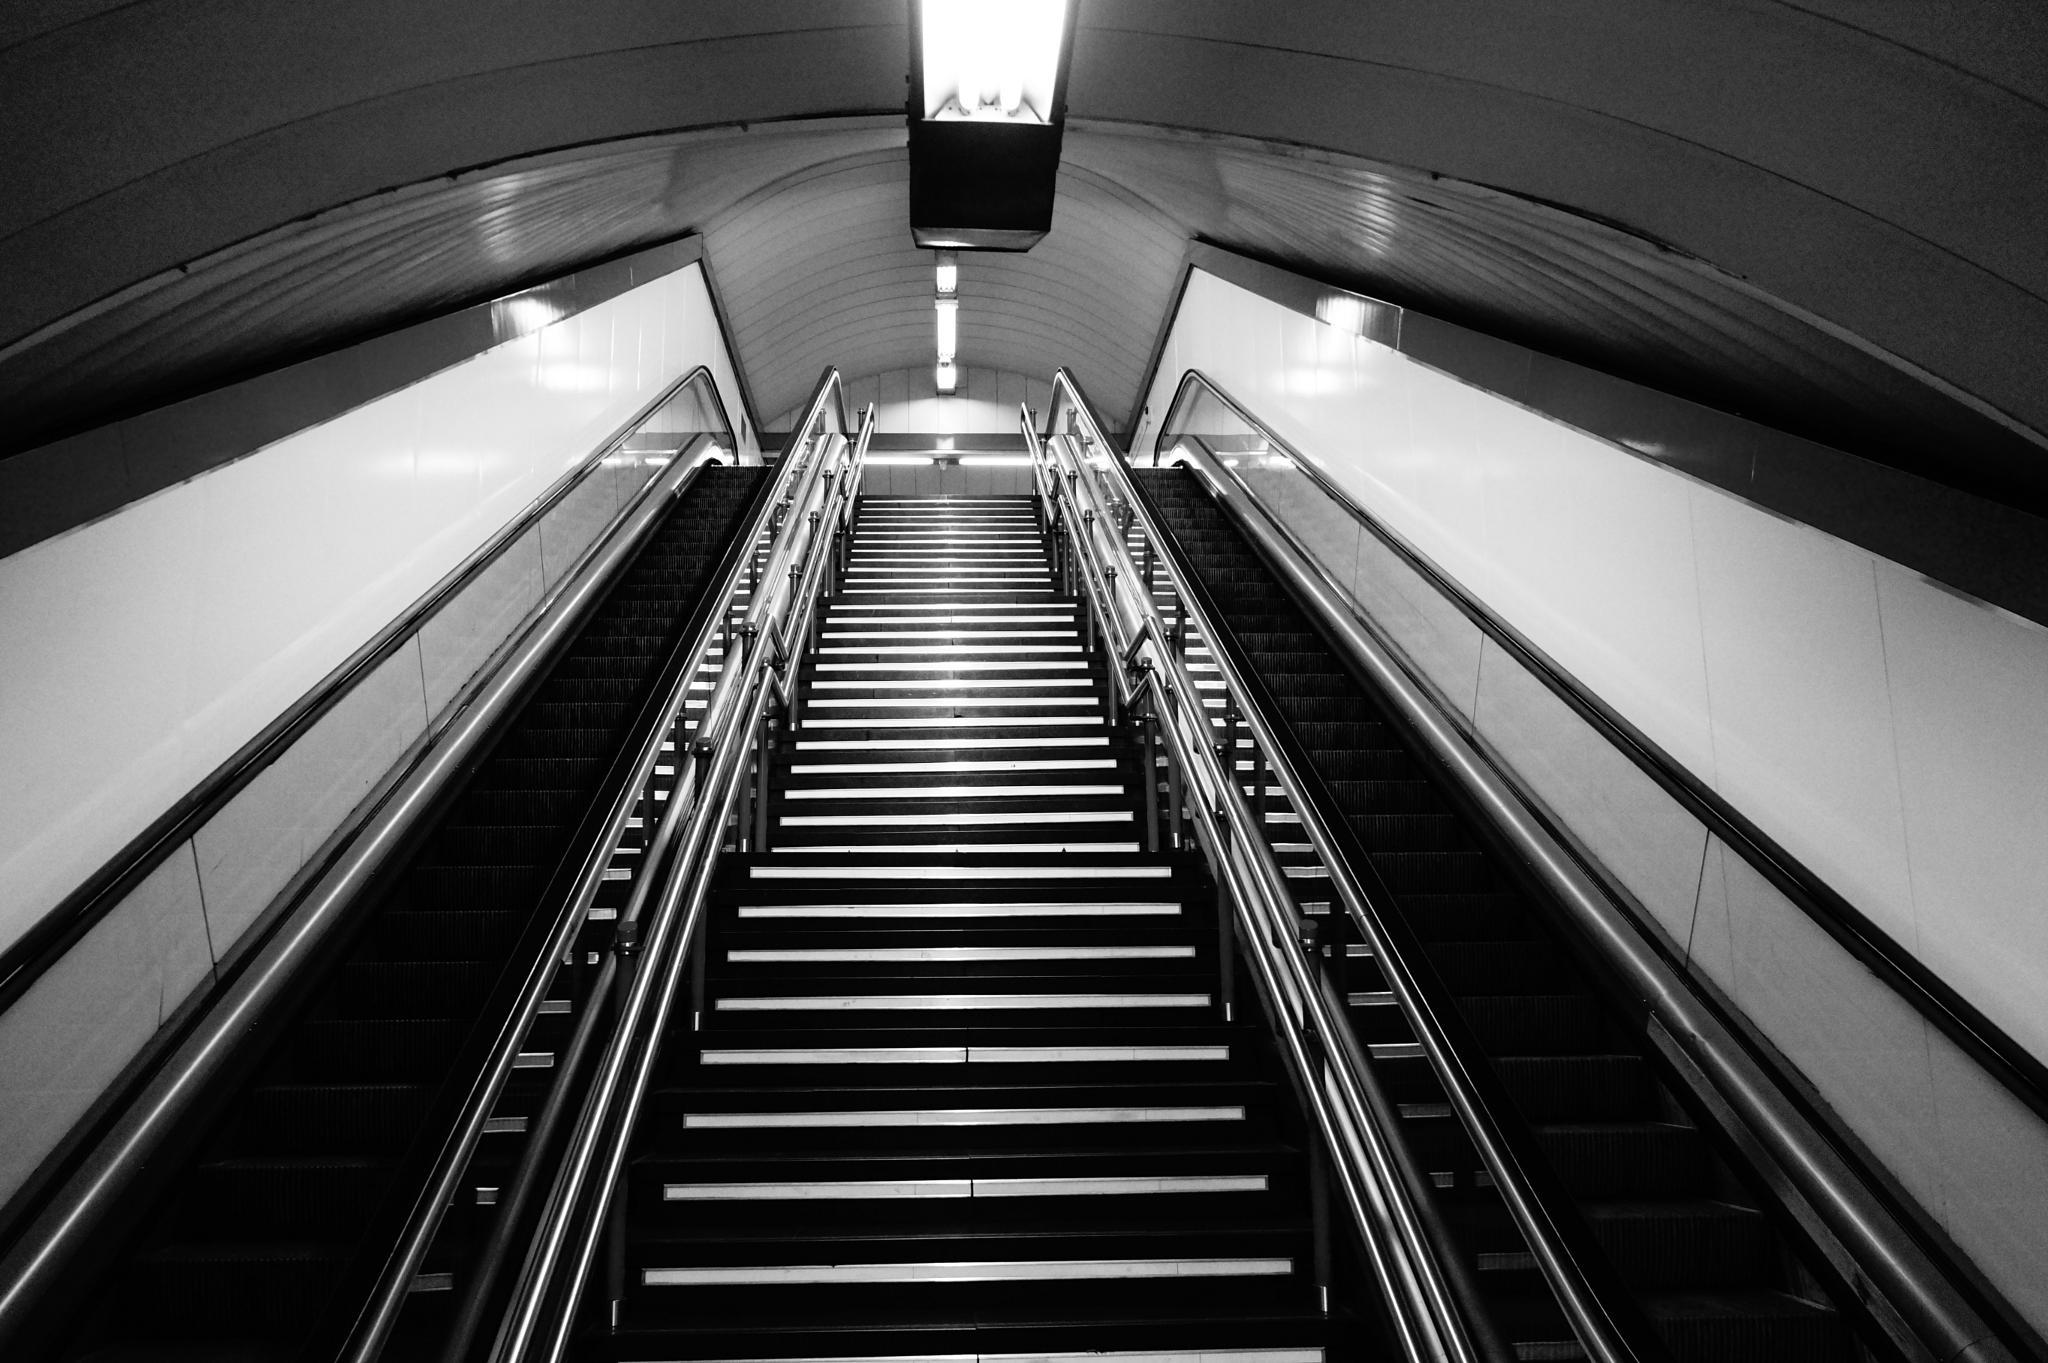 Stairs by Malatesta70